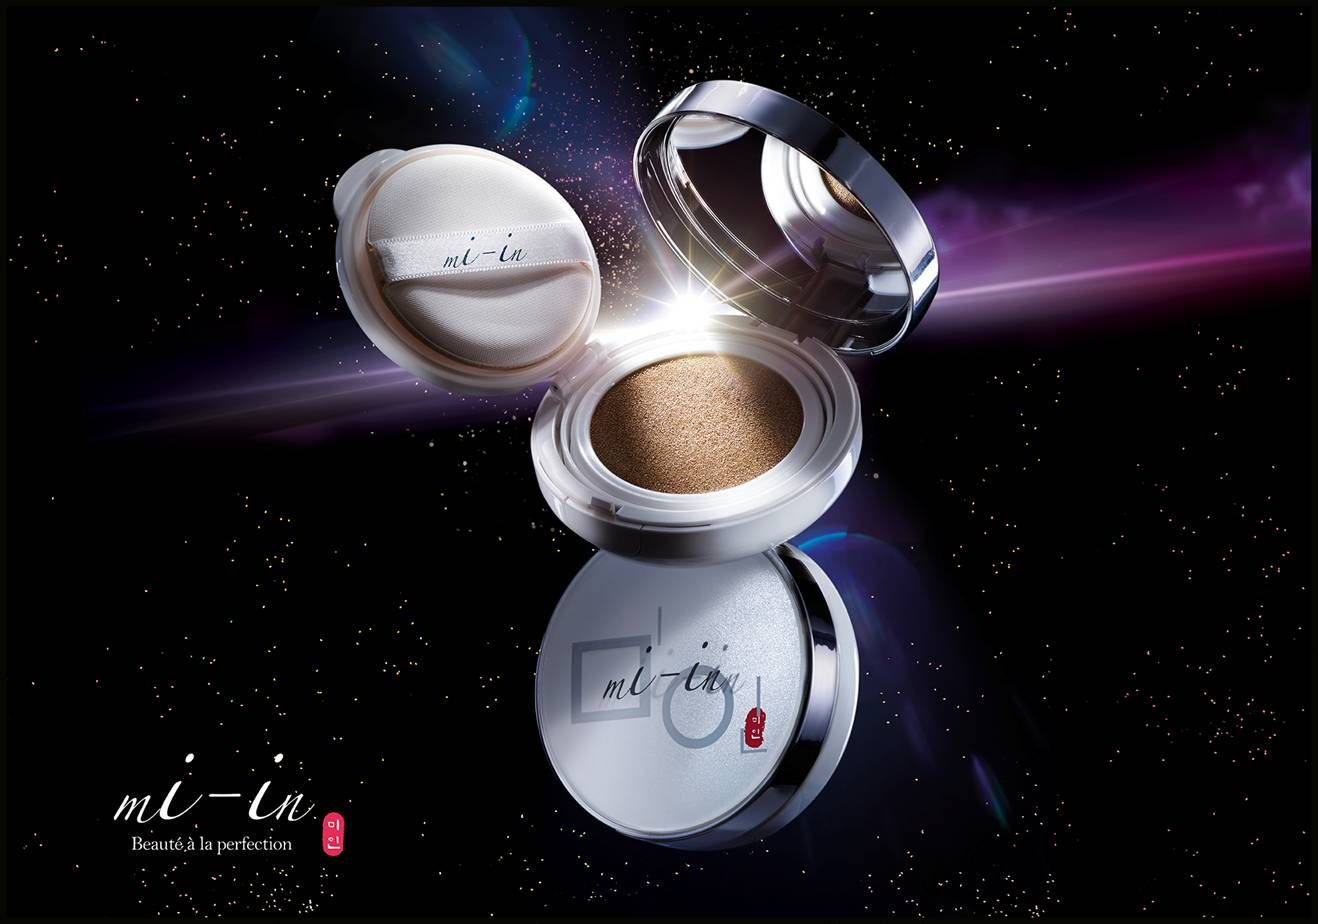 Mi iN BiBi Nova en Marta García Boutique #Maquillaje #Makeup @wishtrend